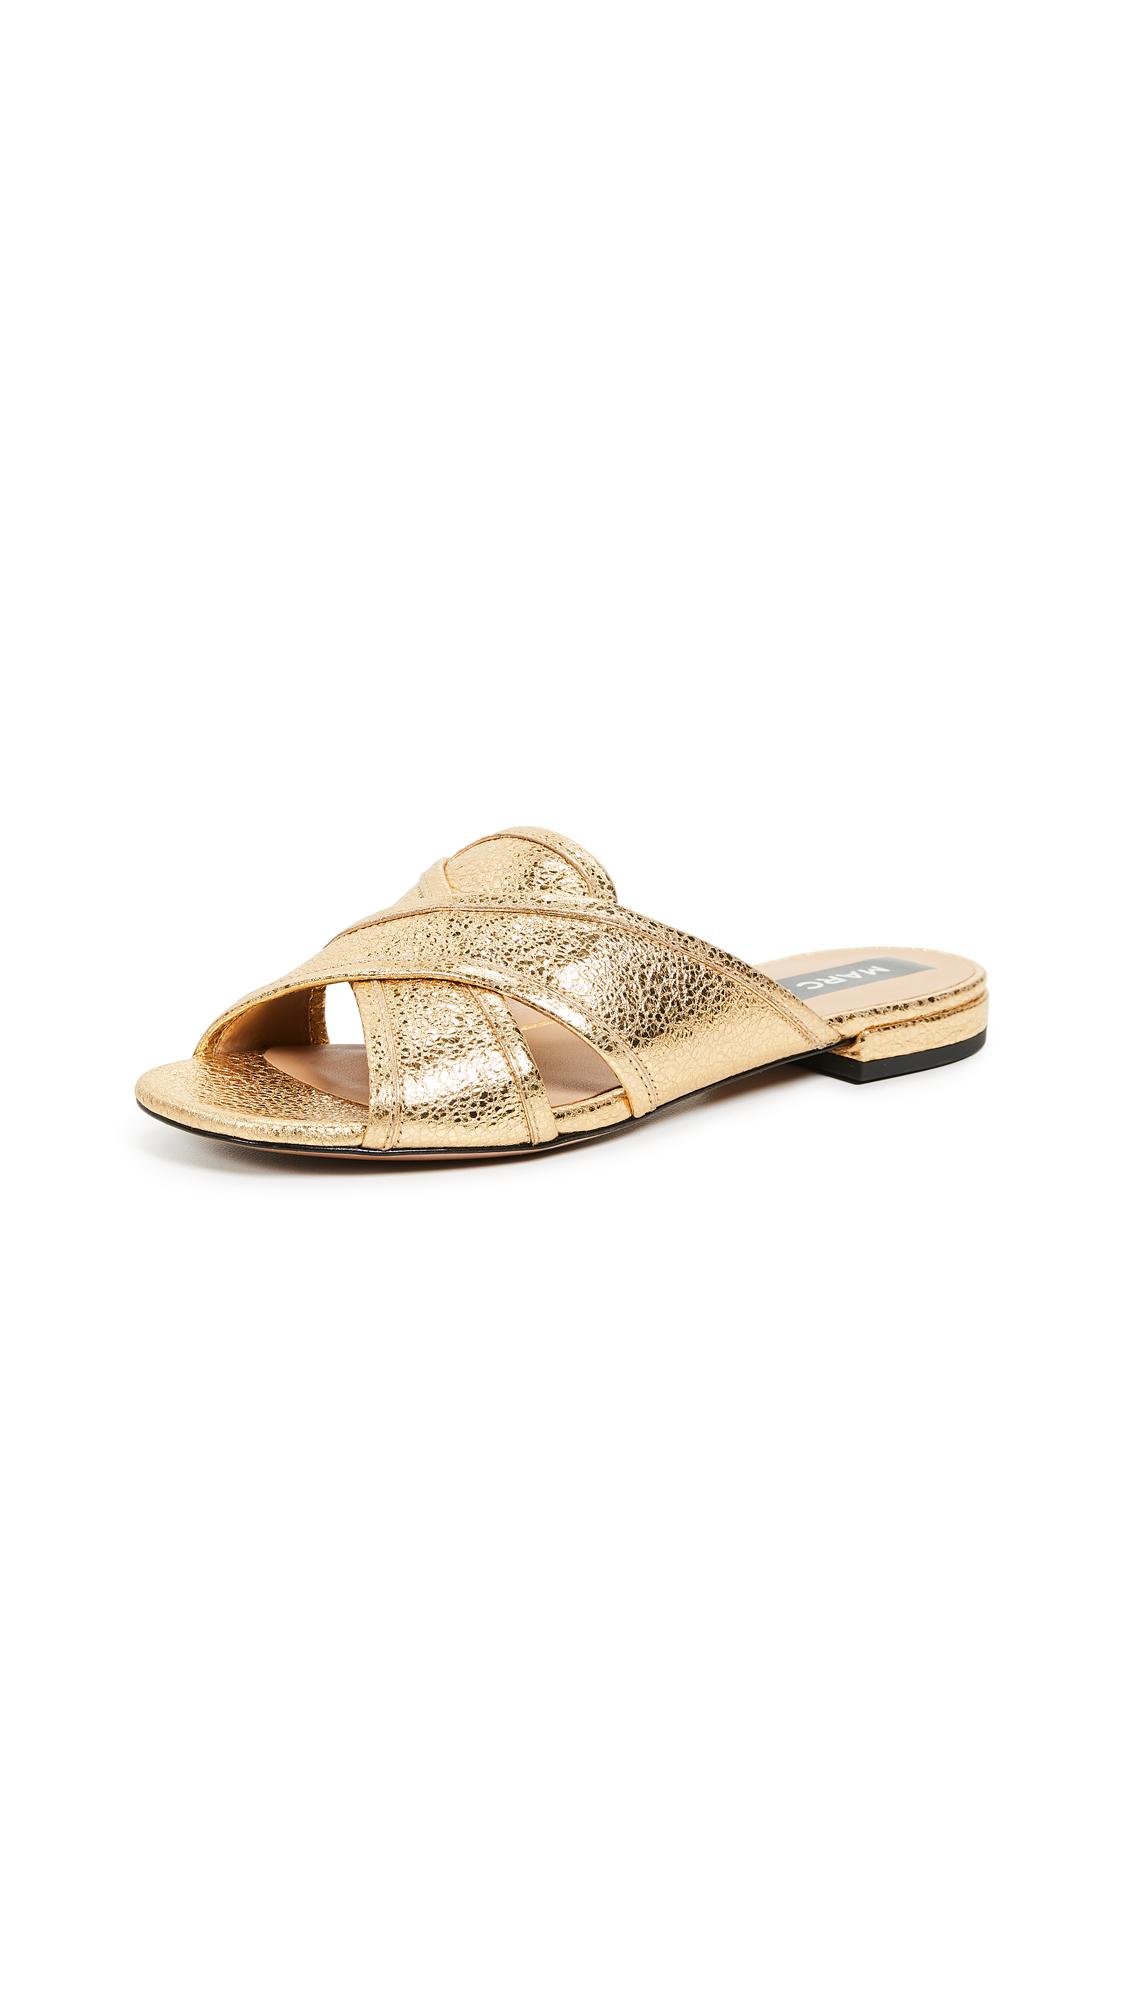 Marc Jacobs Aurora Flat Sandal - Gold